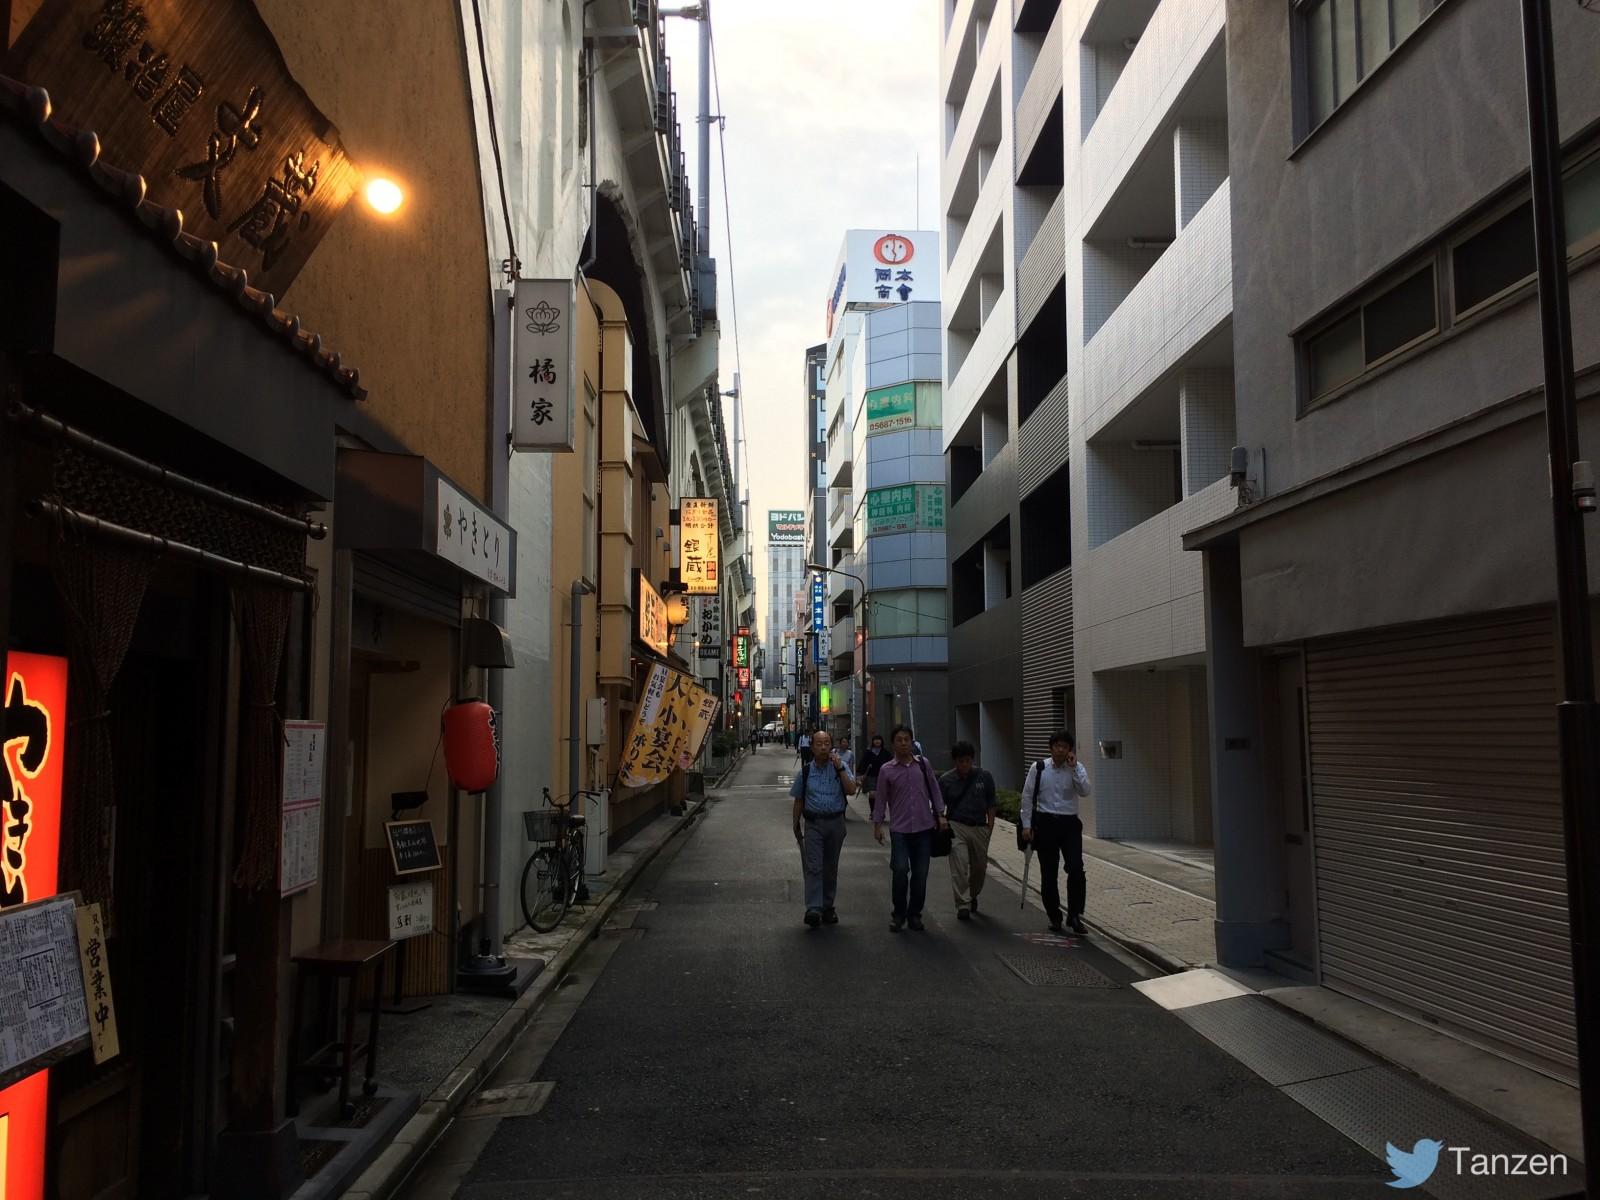 2014-09-11 17.02.44 HDR_watermark